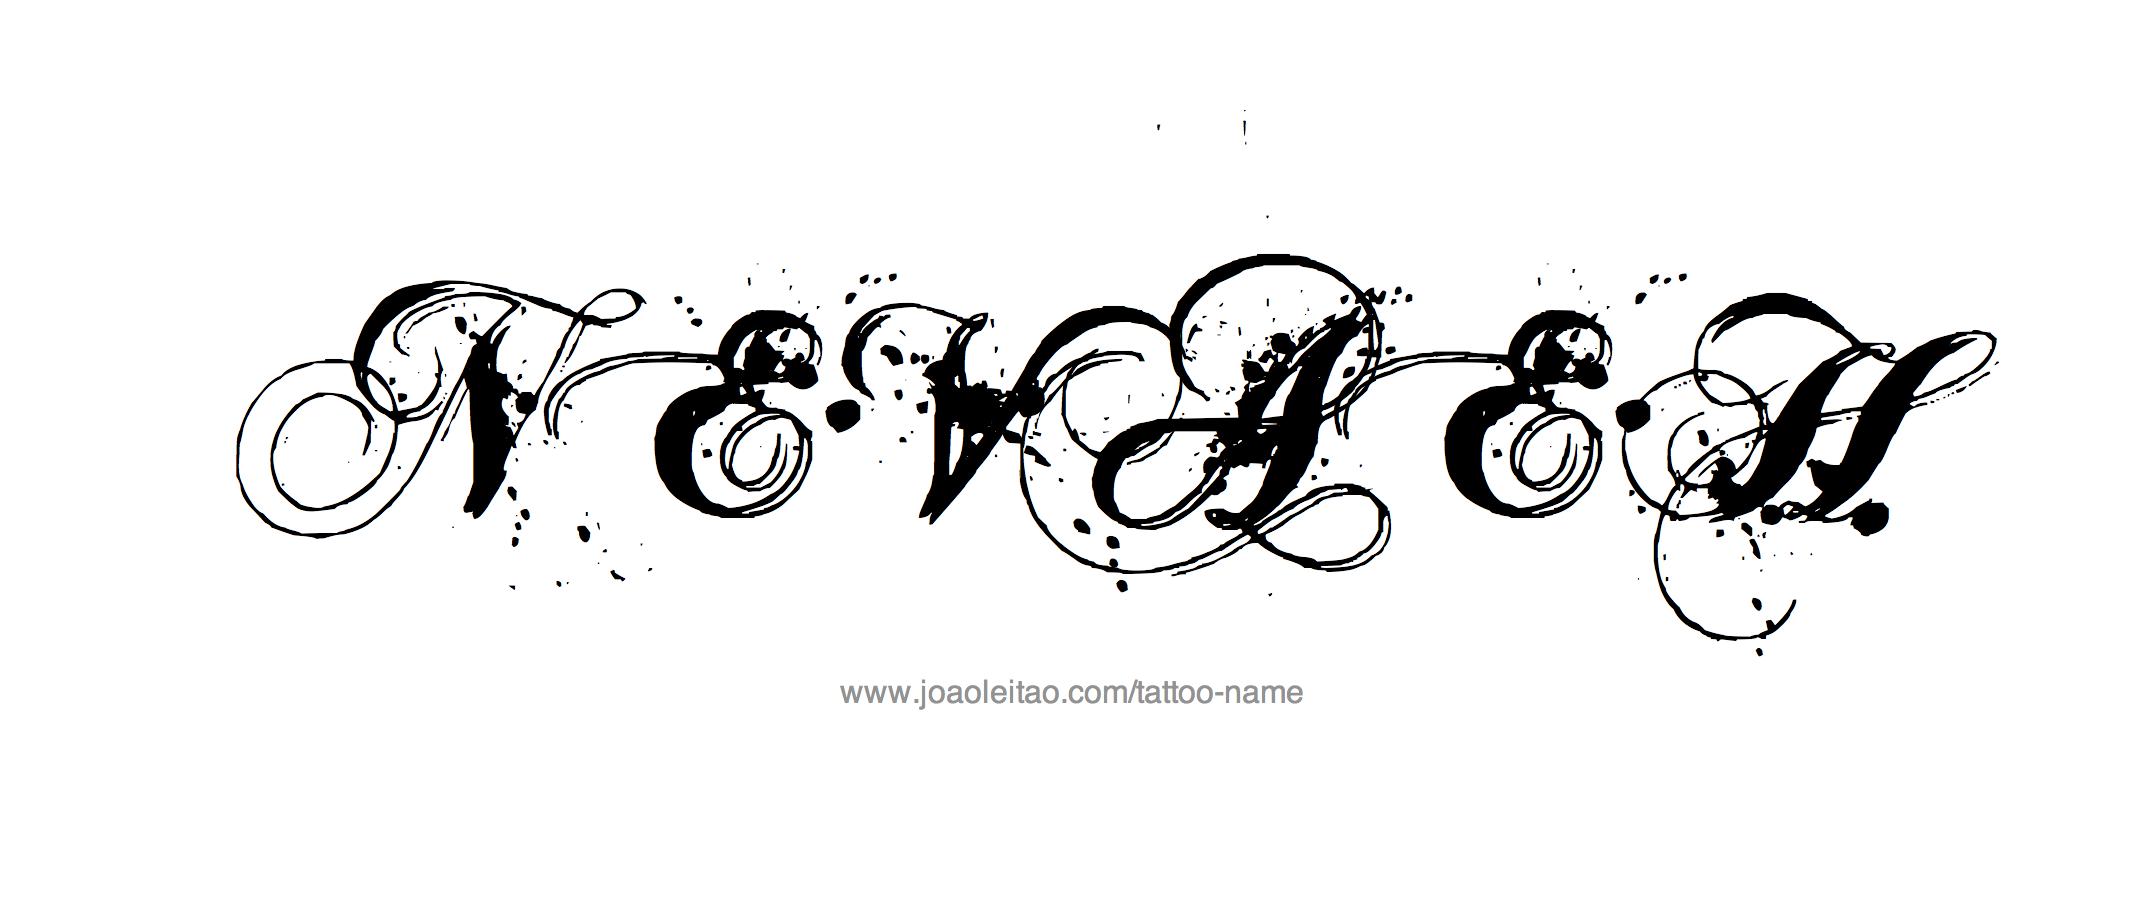 tattoo-design-female-name-nevaeh%20(27).png